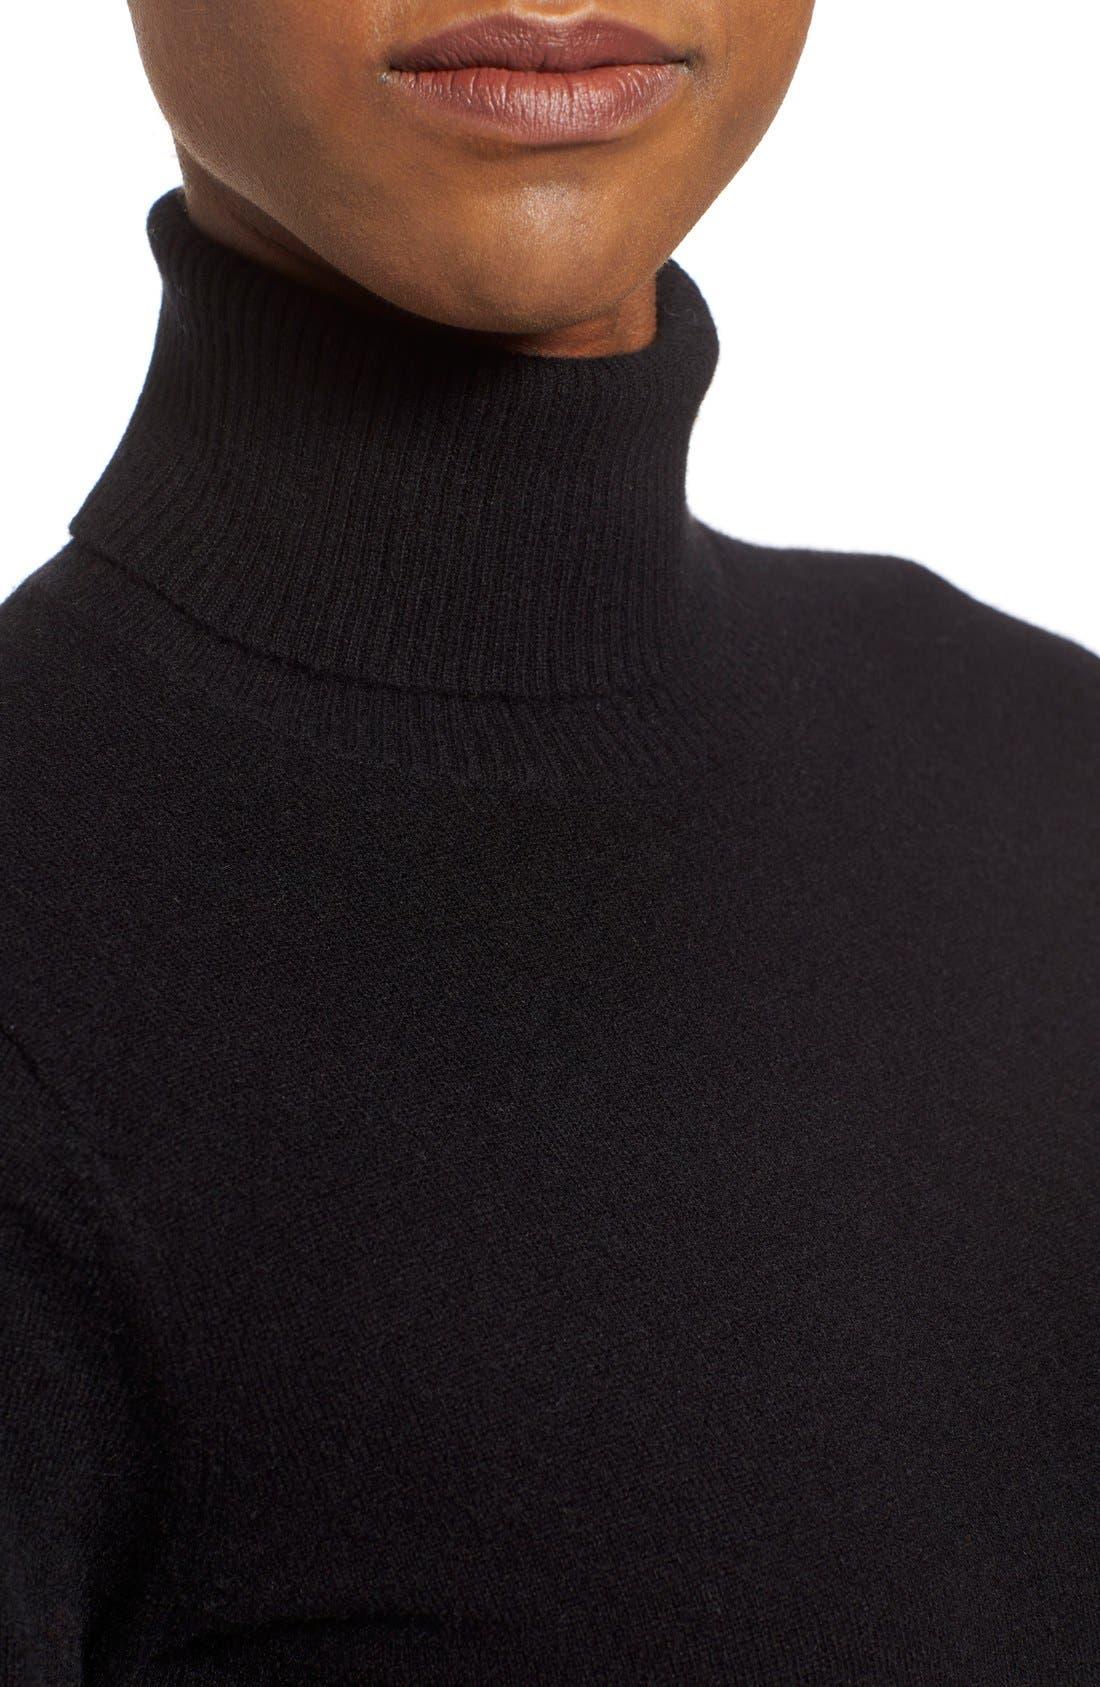 NORDSTROM COLLECTION,                             Cashmere Turtleneck Sweater,                             Alternate thumbnail 2, color,                             001